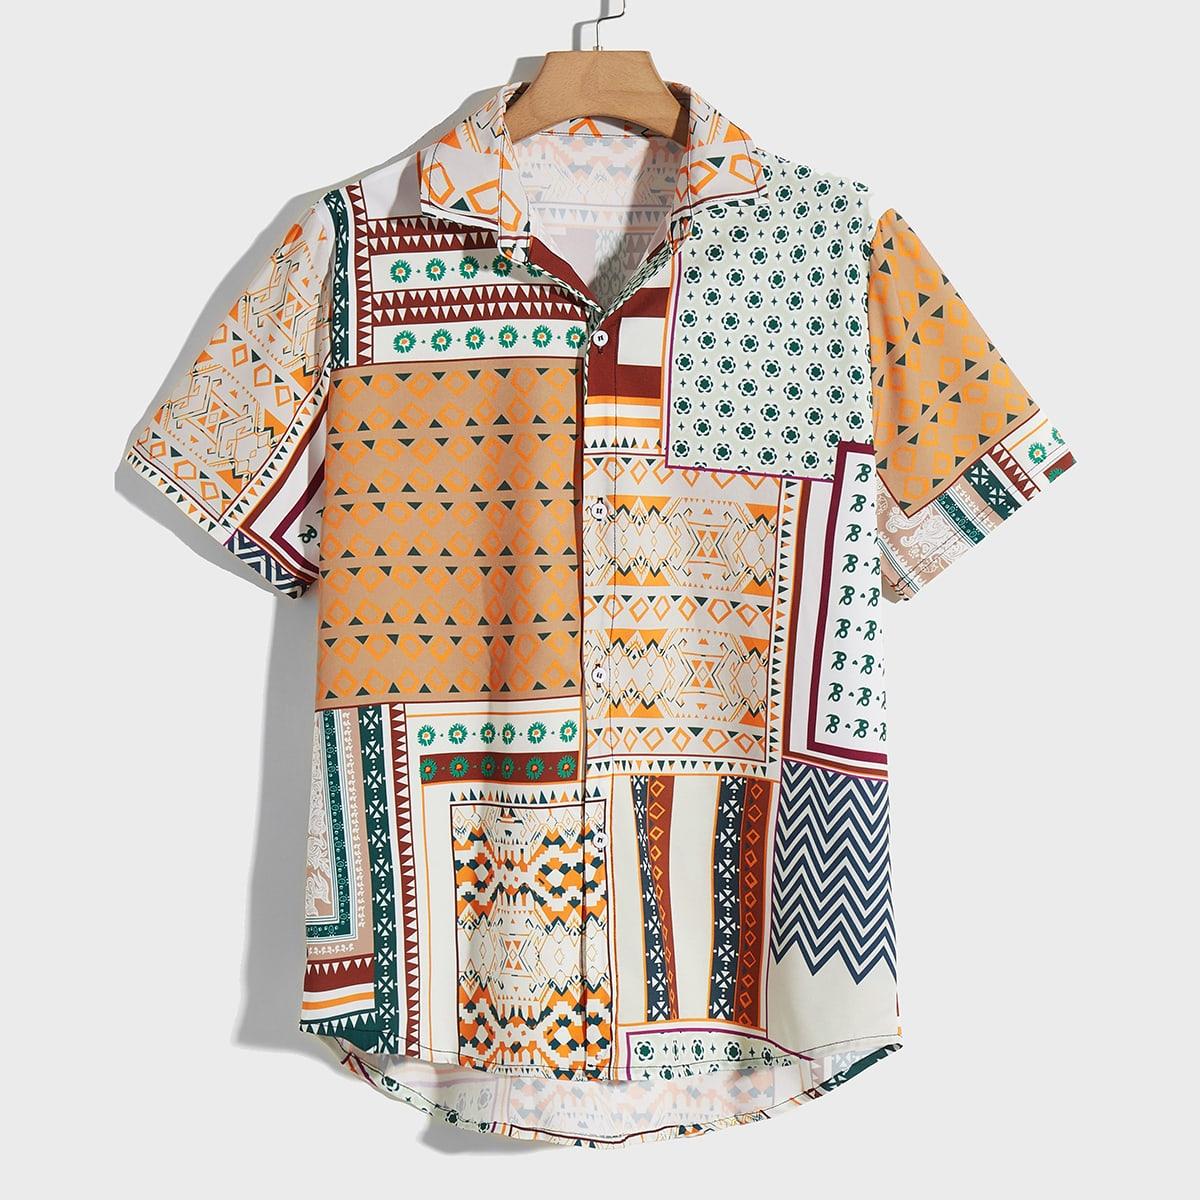 Мужская рубашка с геометрическим узором на пуговицах